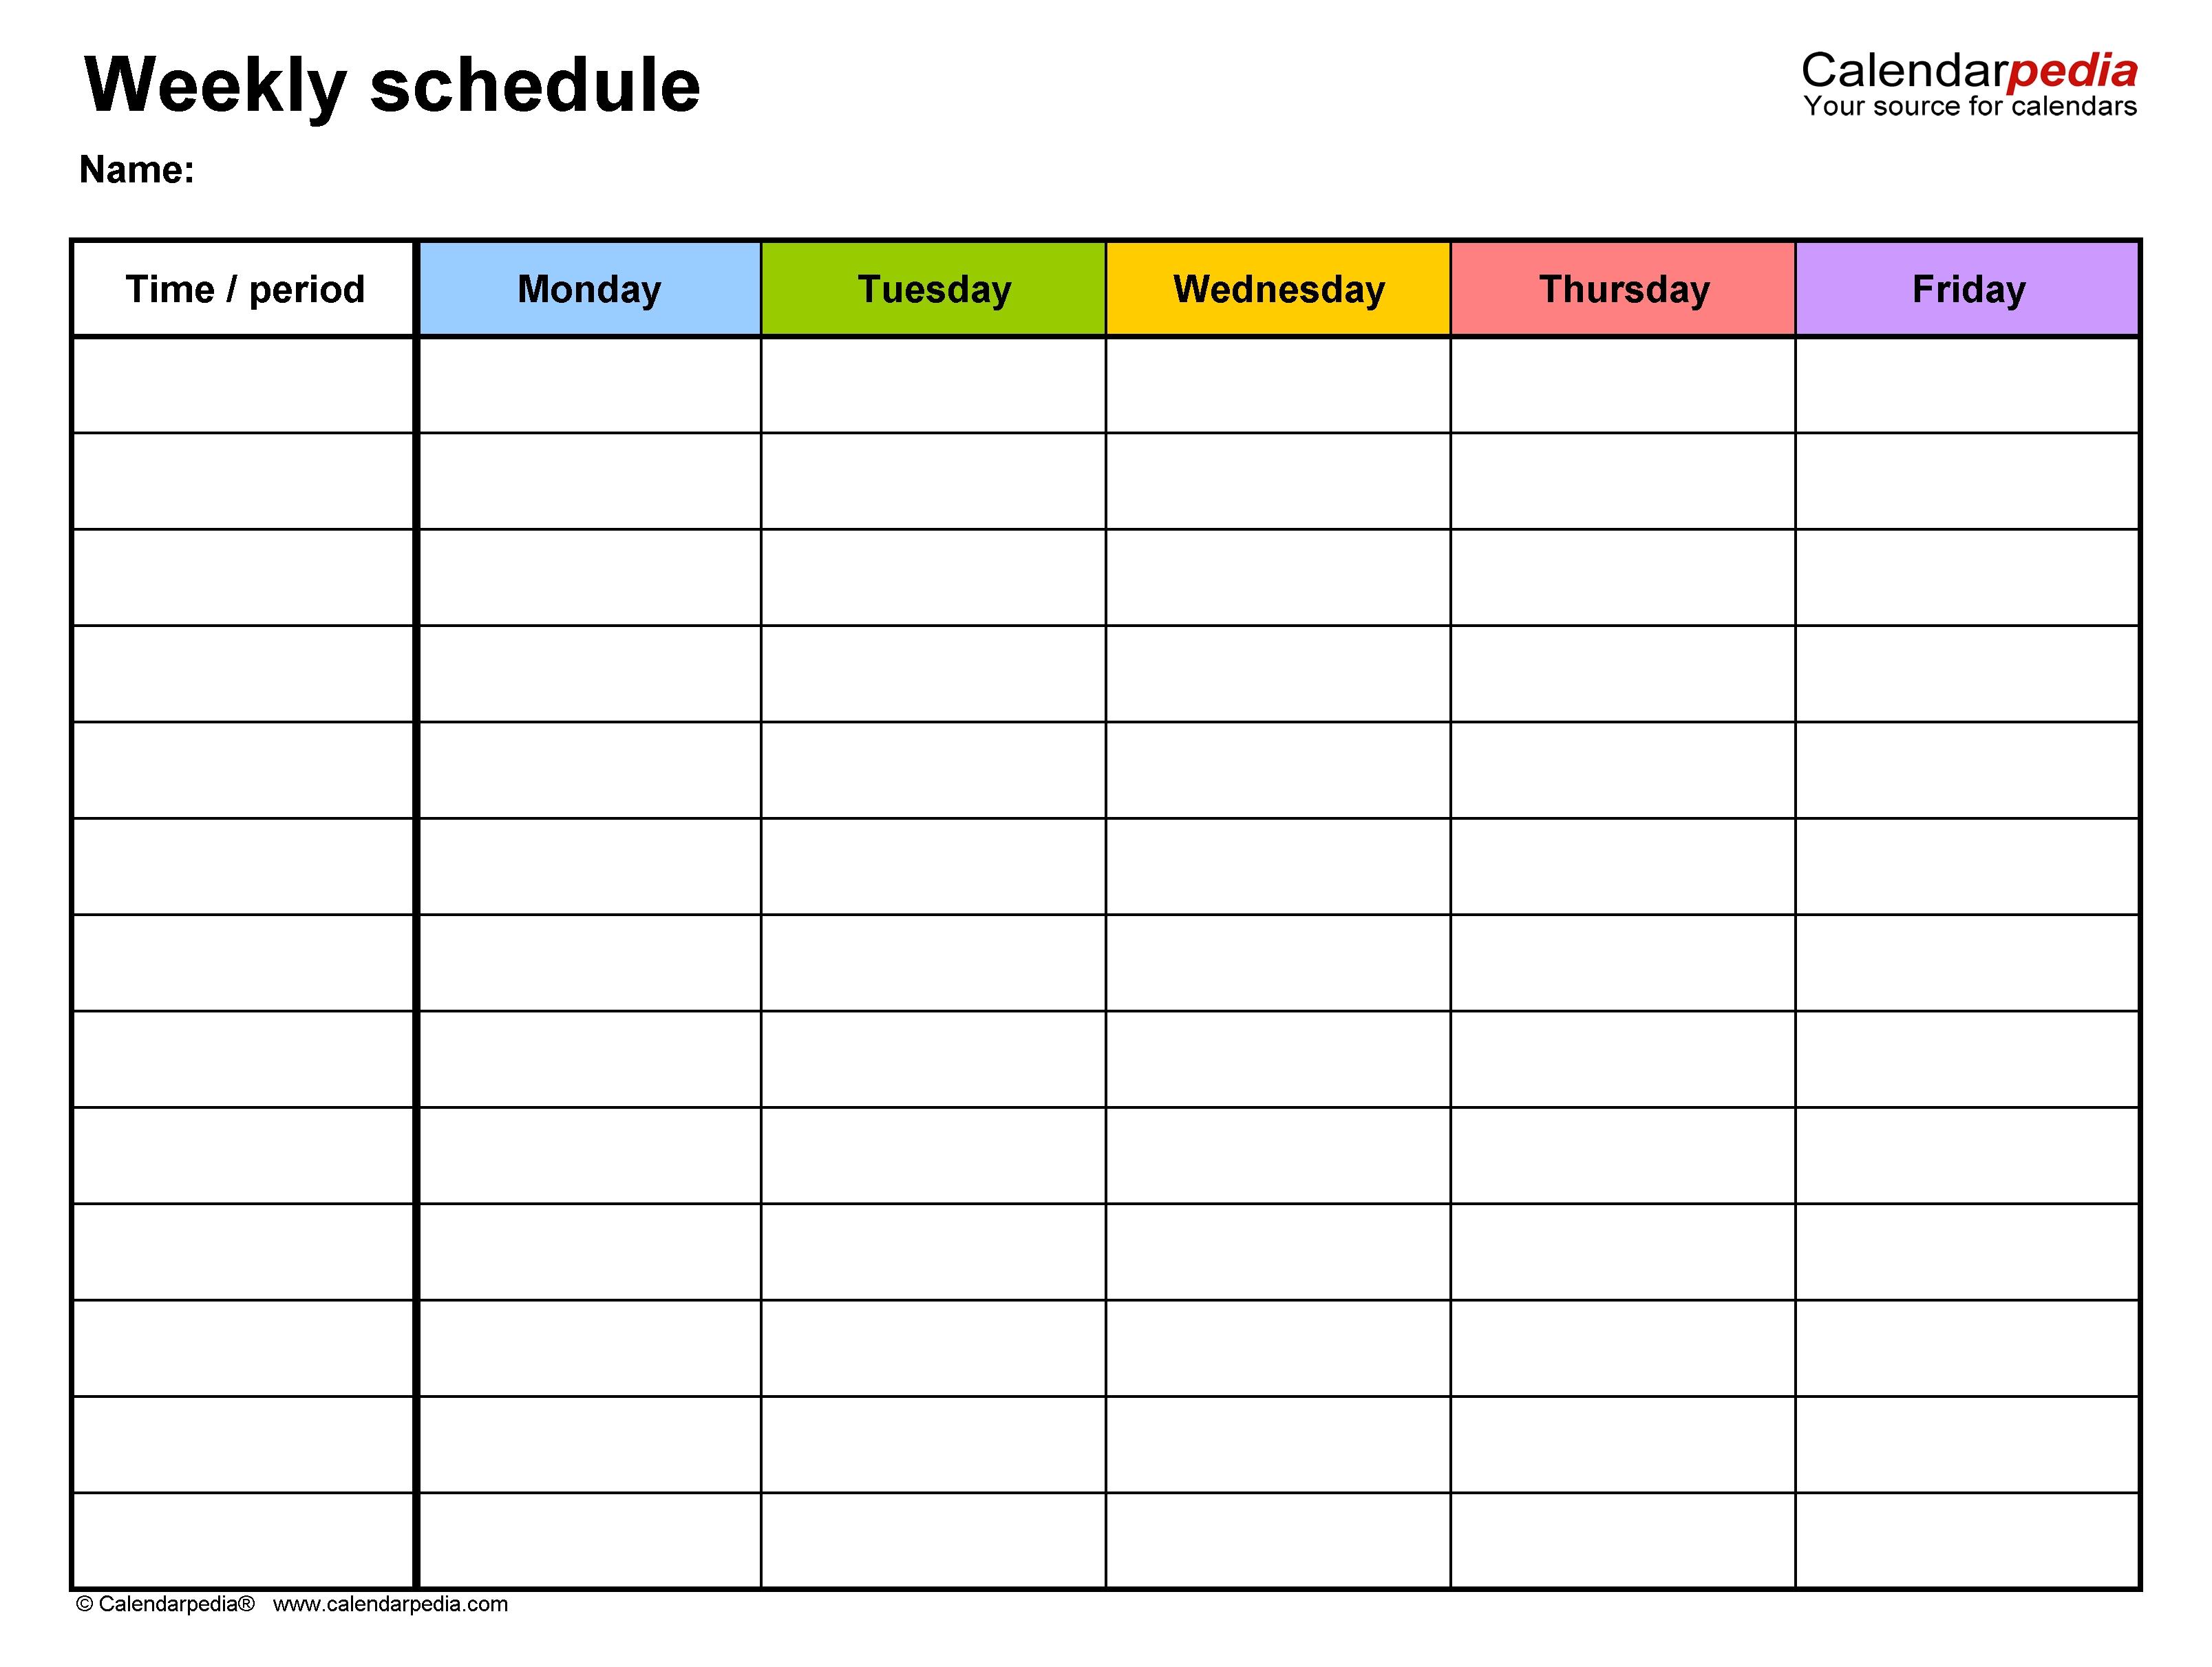 Free Weekly Schedule Templates For Word - 18 Templates Calendar Template Work Week